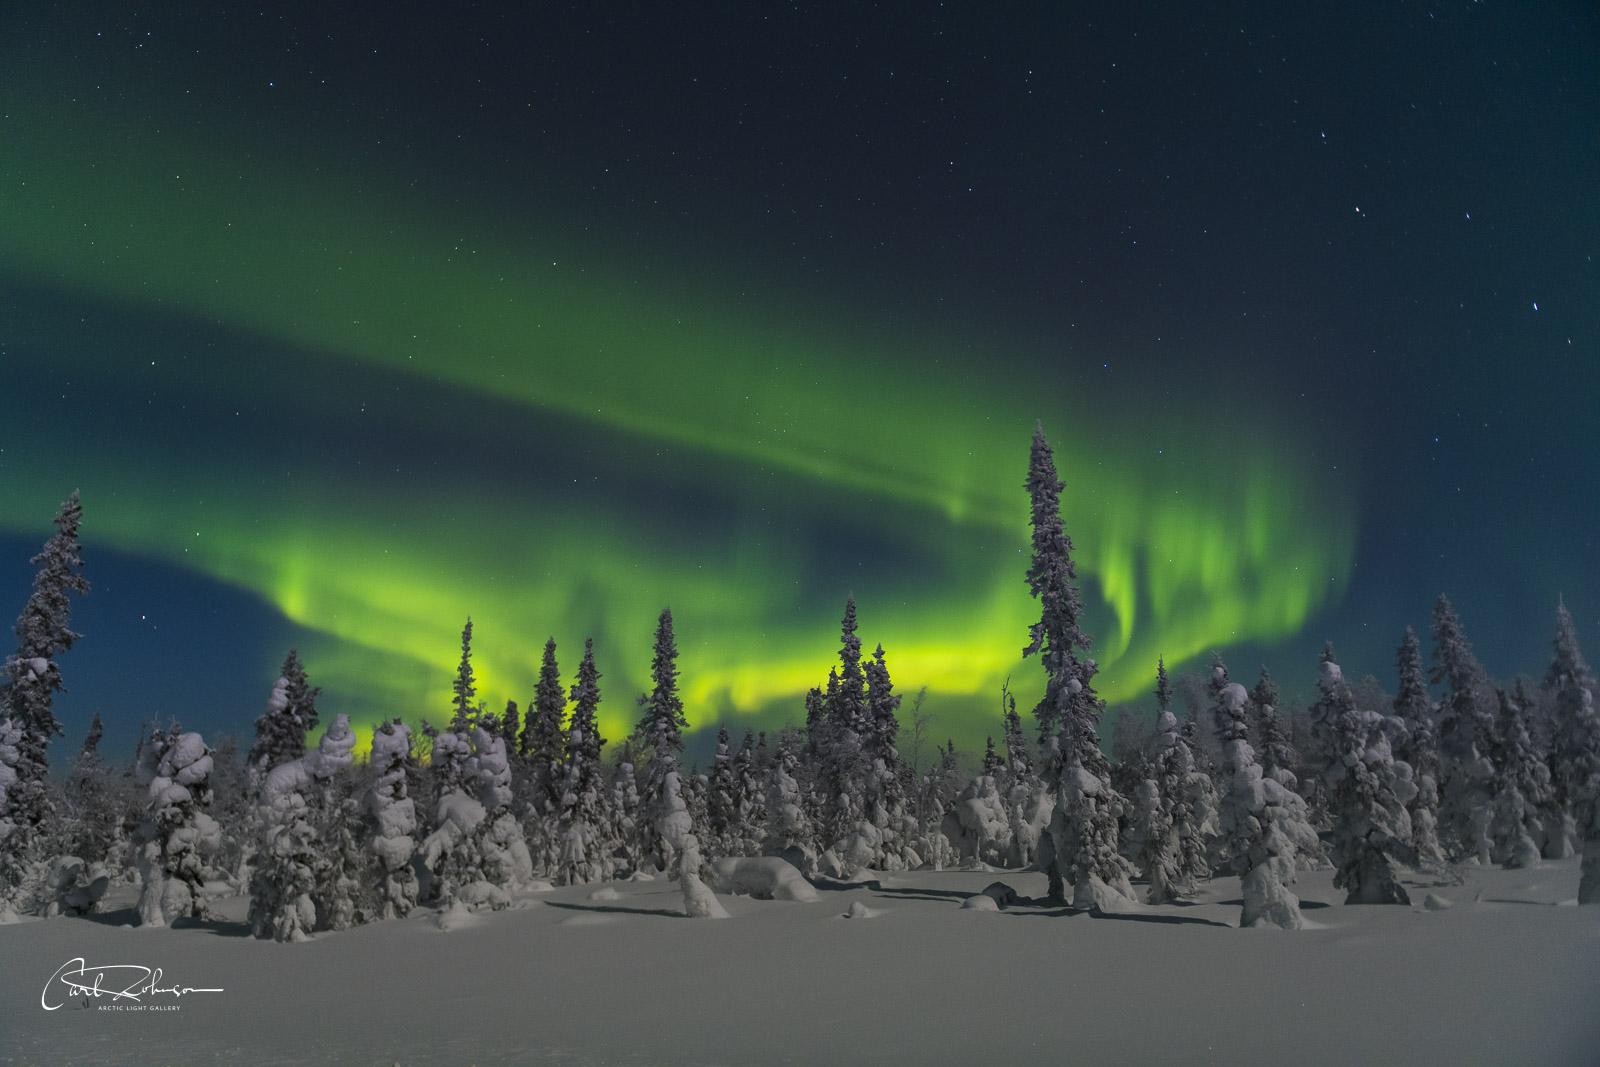 An early aurora borealis dances over snowy trees along the Elliott Highway in Alaska.